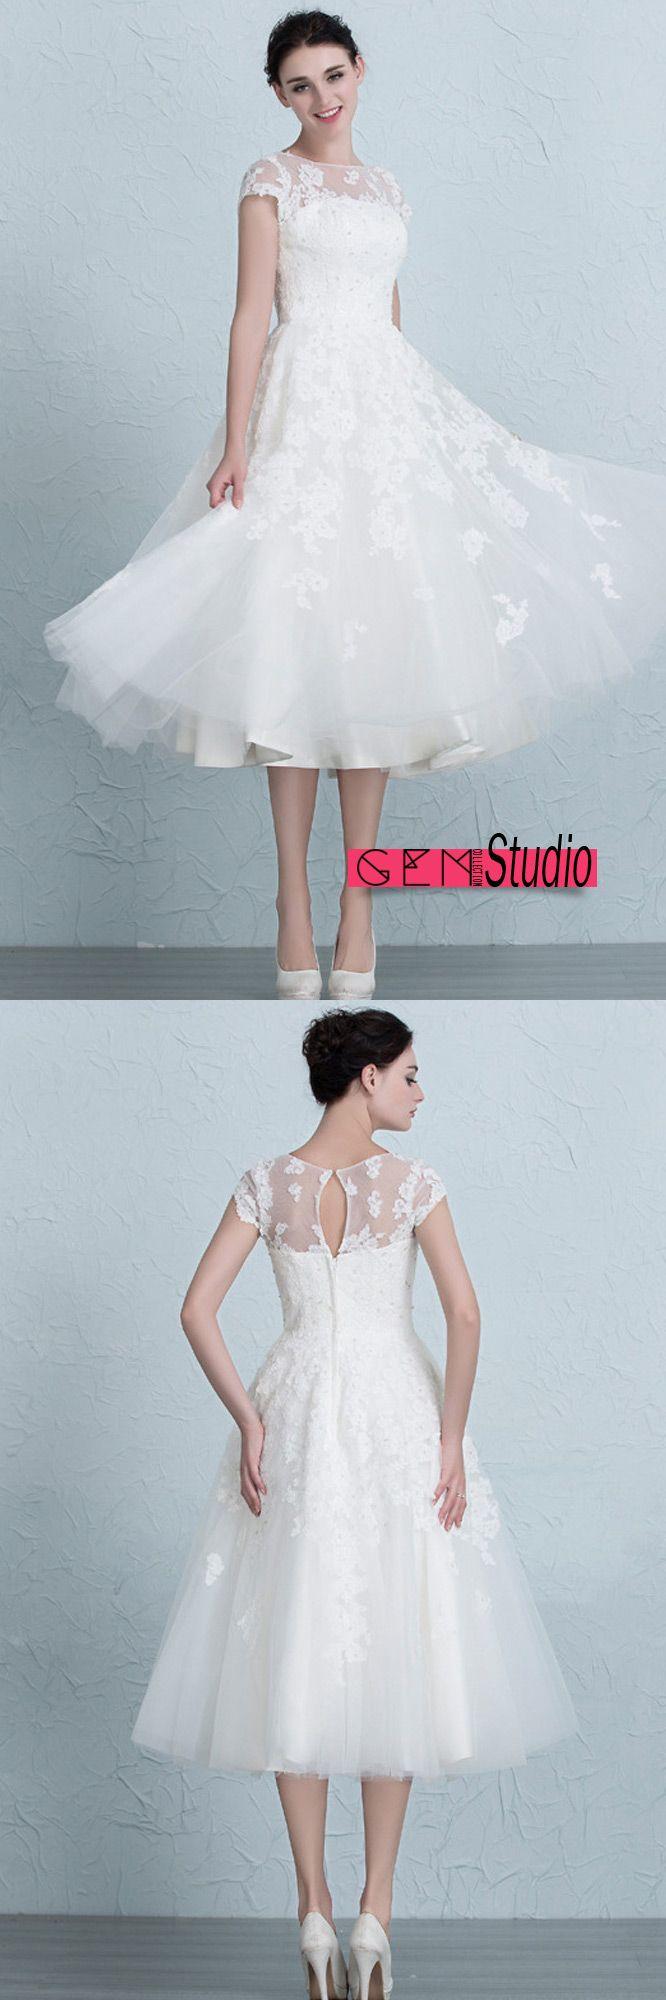 Vintage tea length wedding dresses empire waist lace tulle aline